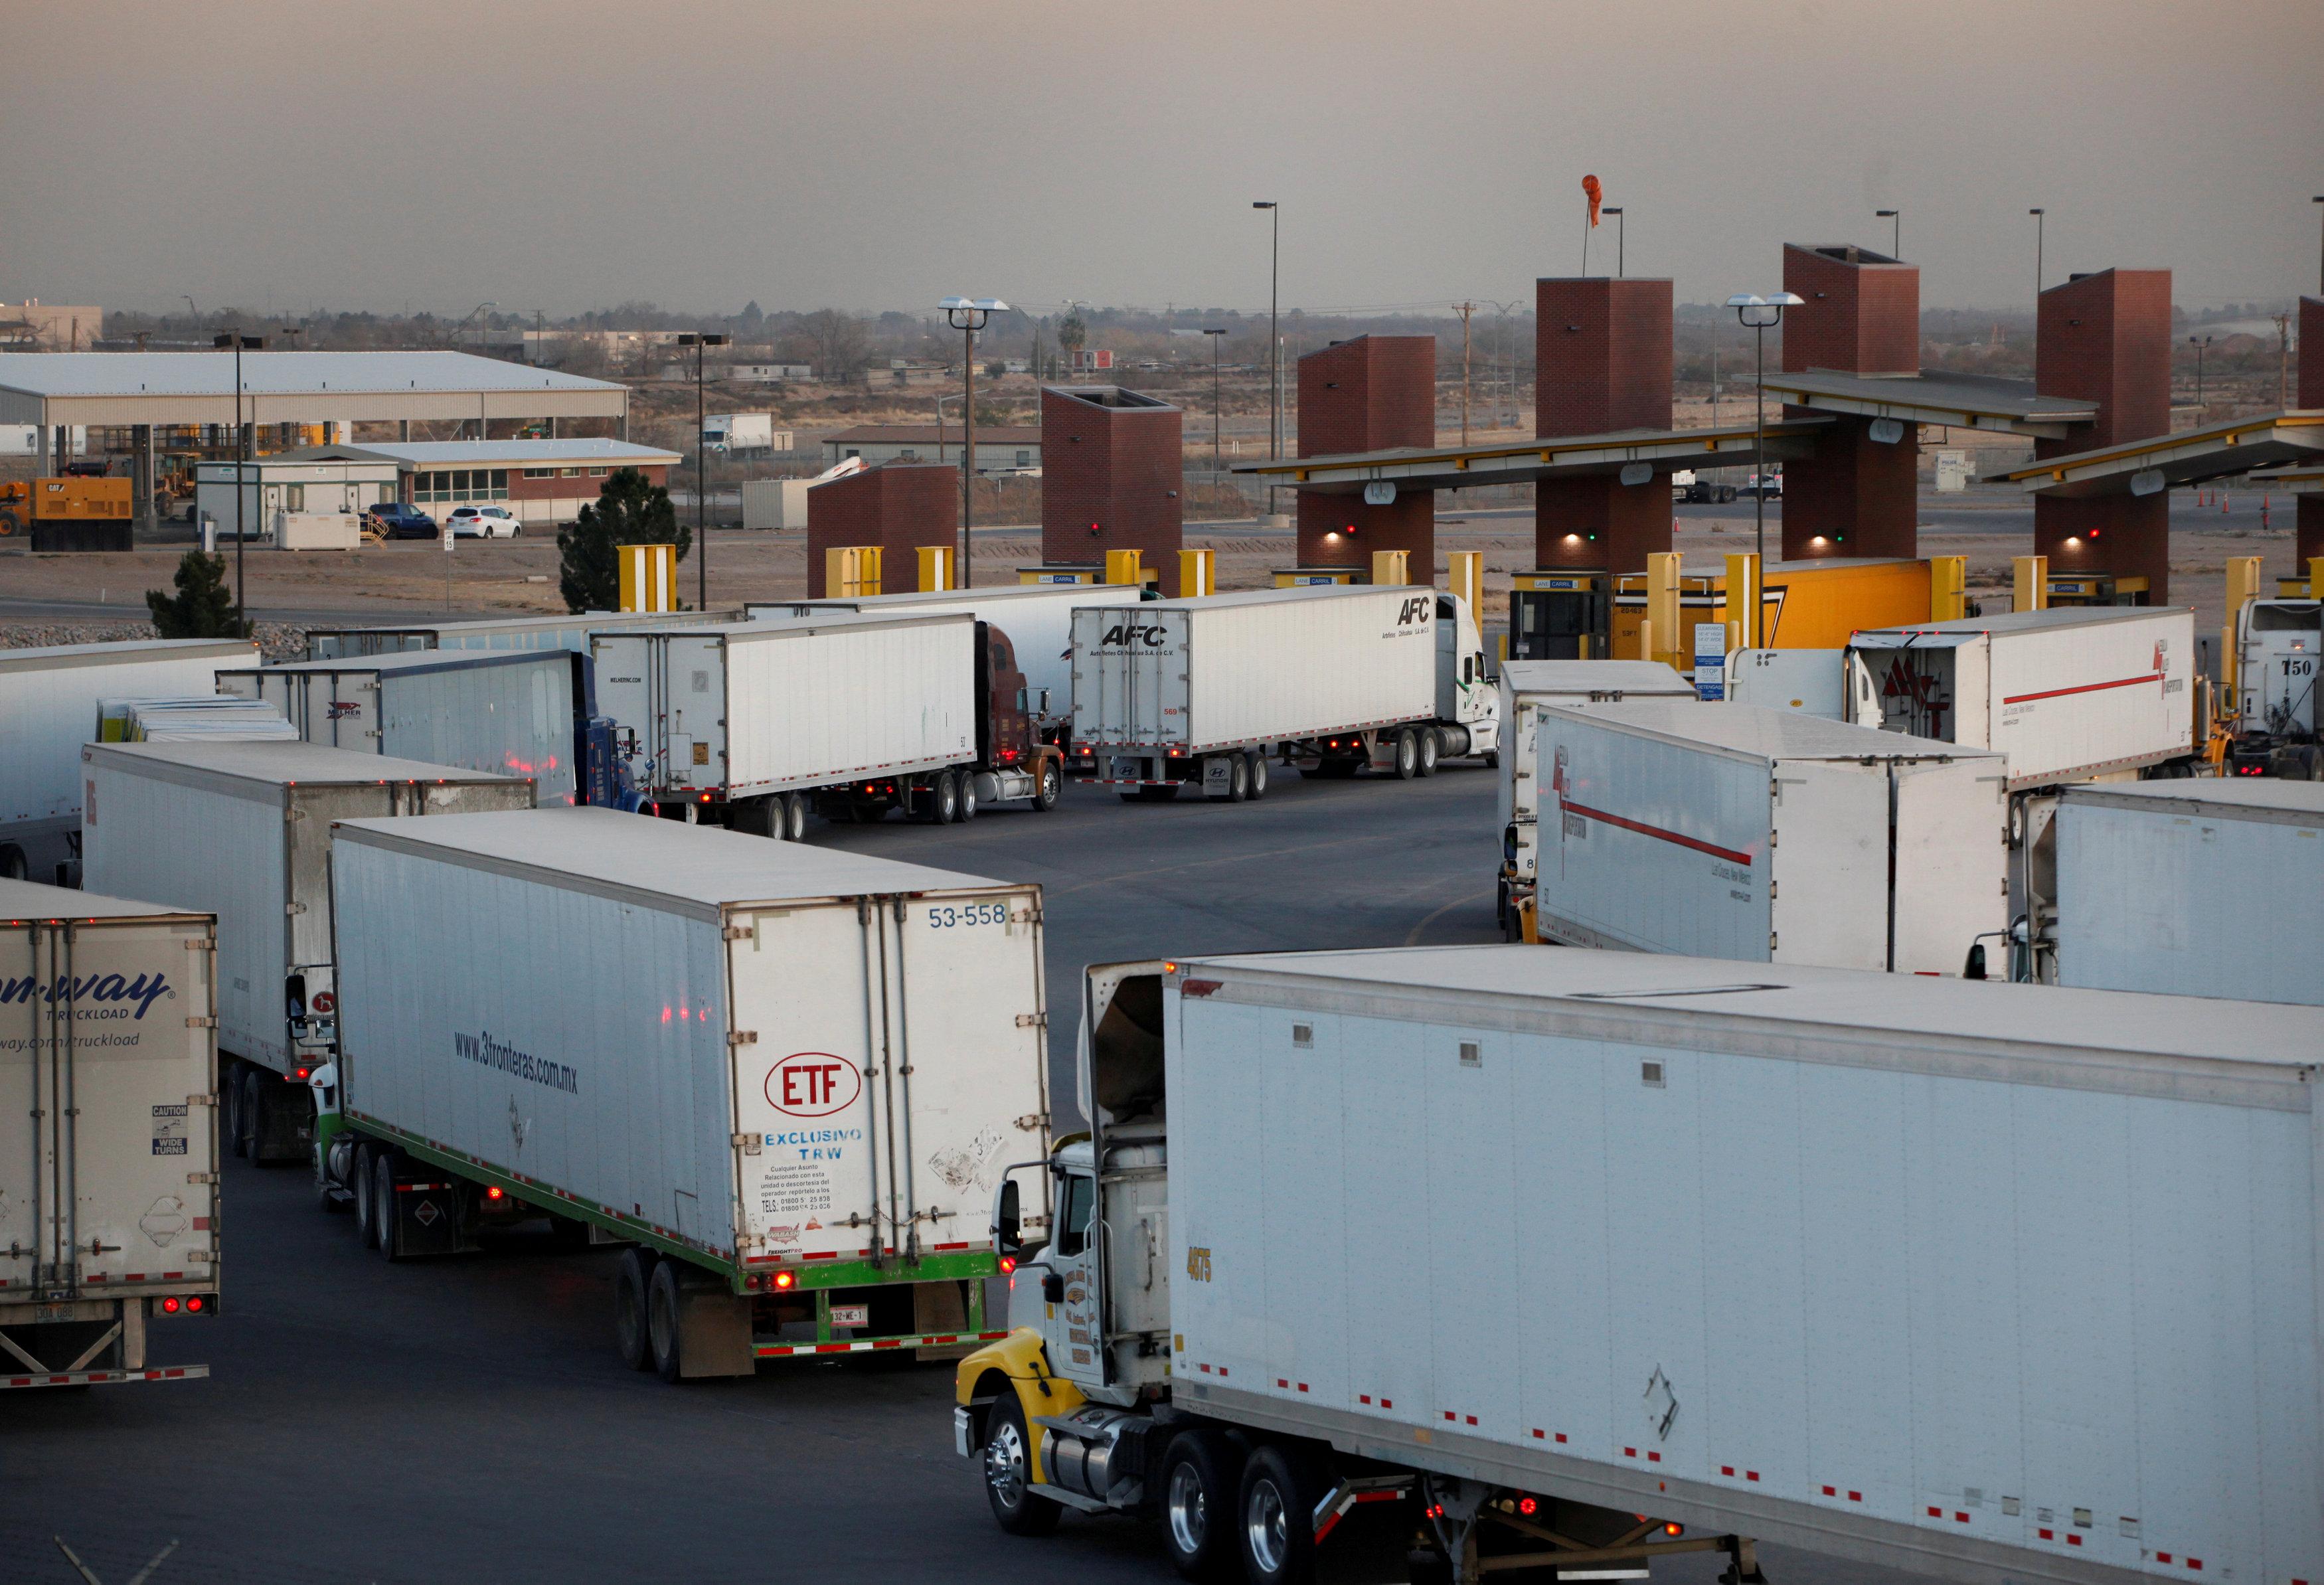 Trucks wait at the international border bridge Zaragoza to cross over to El Paso, USA, in Ciudad Juarez, Mexico, on Dec. 20, 2016. (REUTERS/Jose Luis Gonzalez)